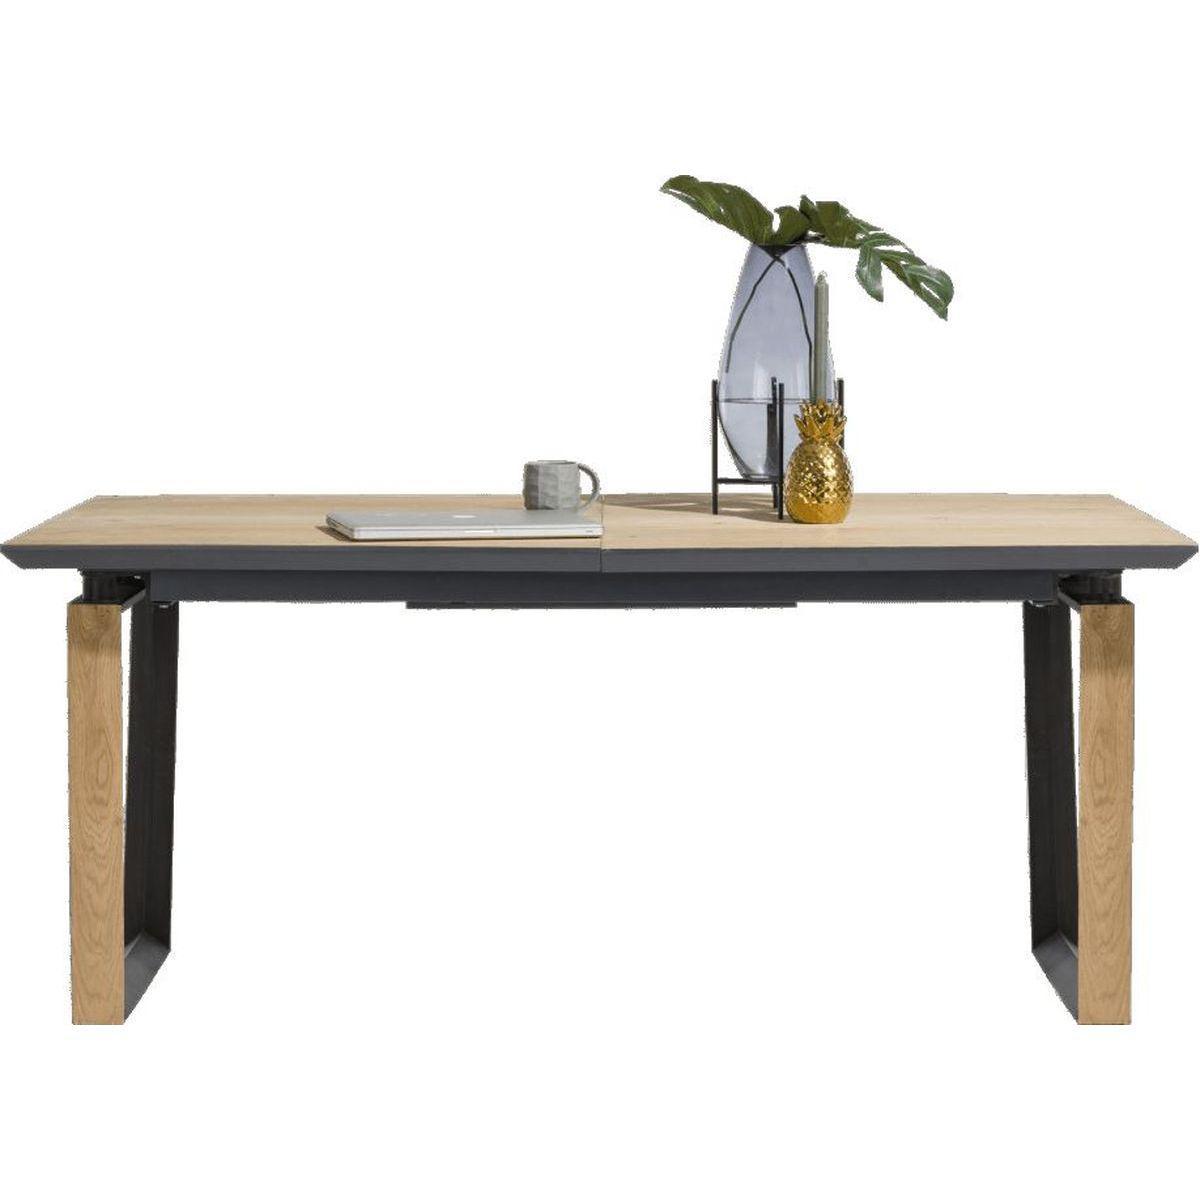 Table à rallonge DARWIN XOOON 100 x 190-250 cm